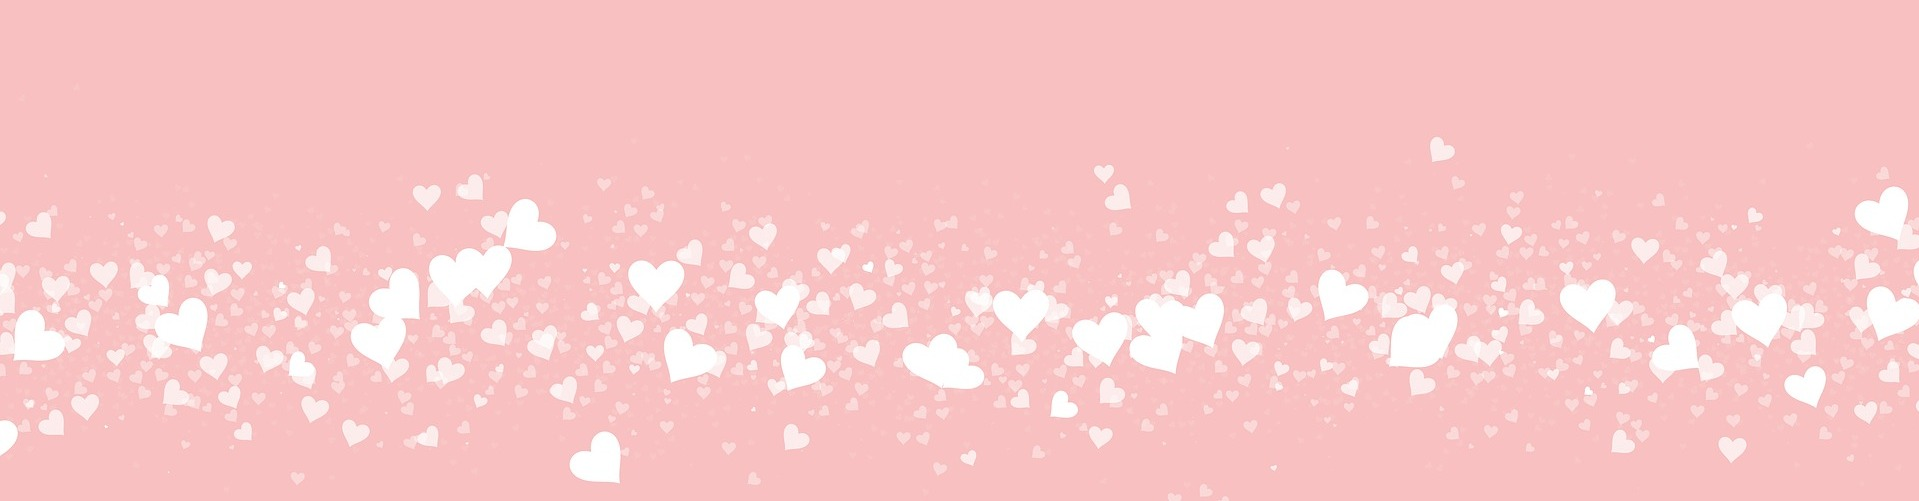 heart-3972327_1920